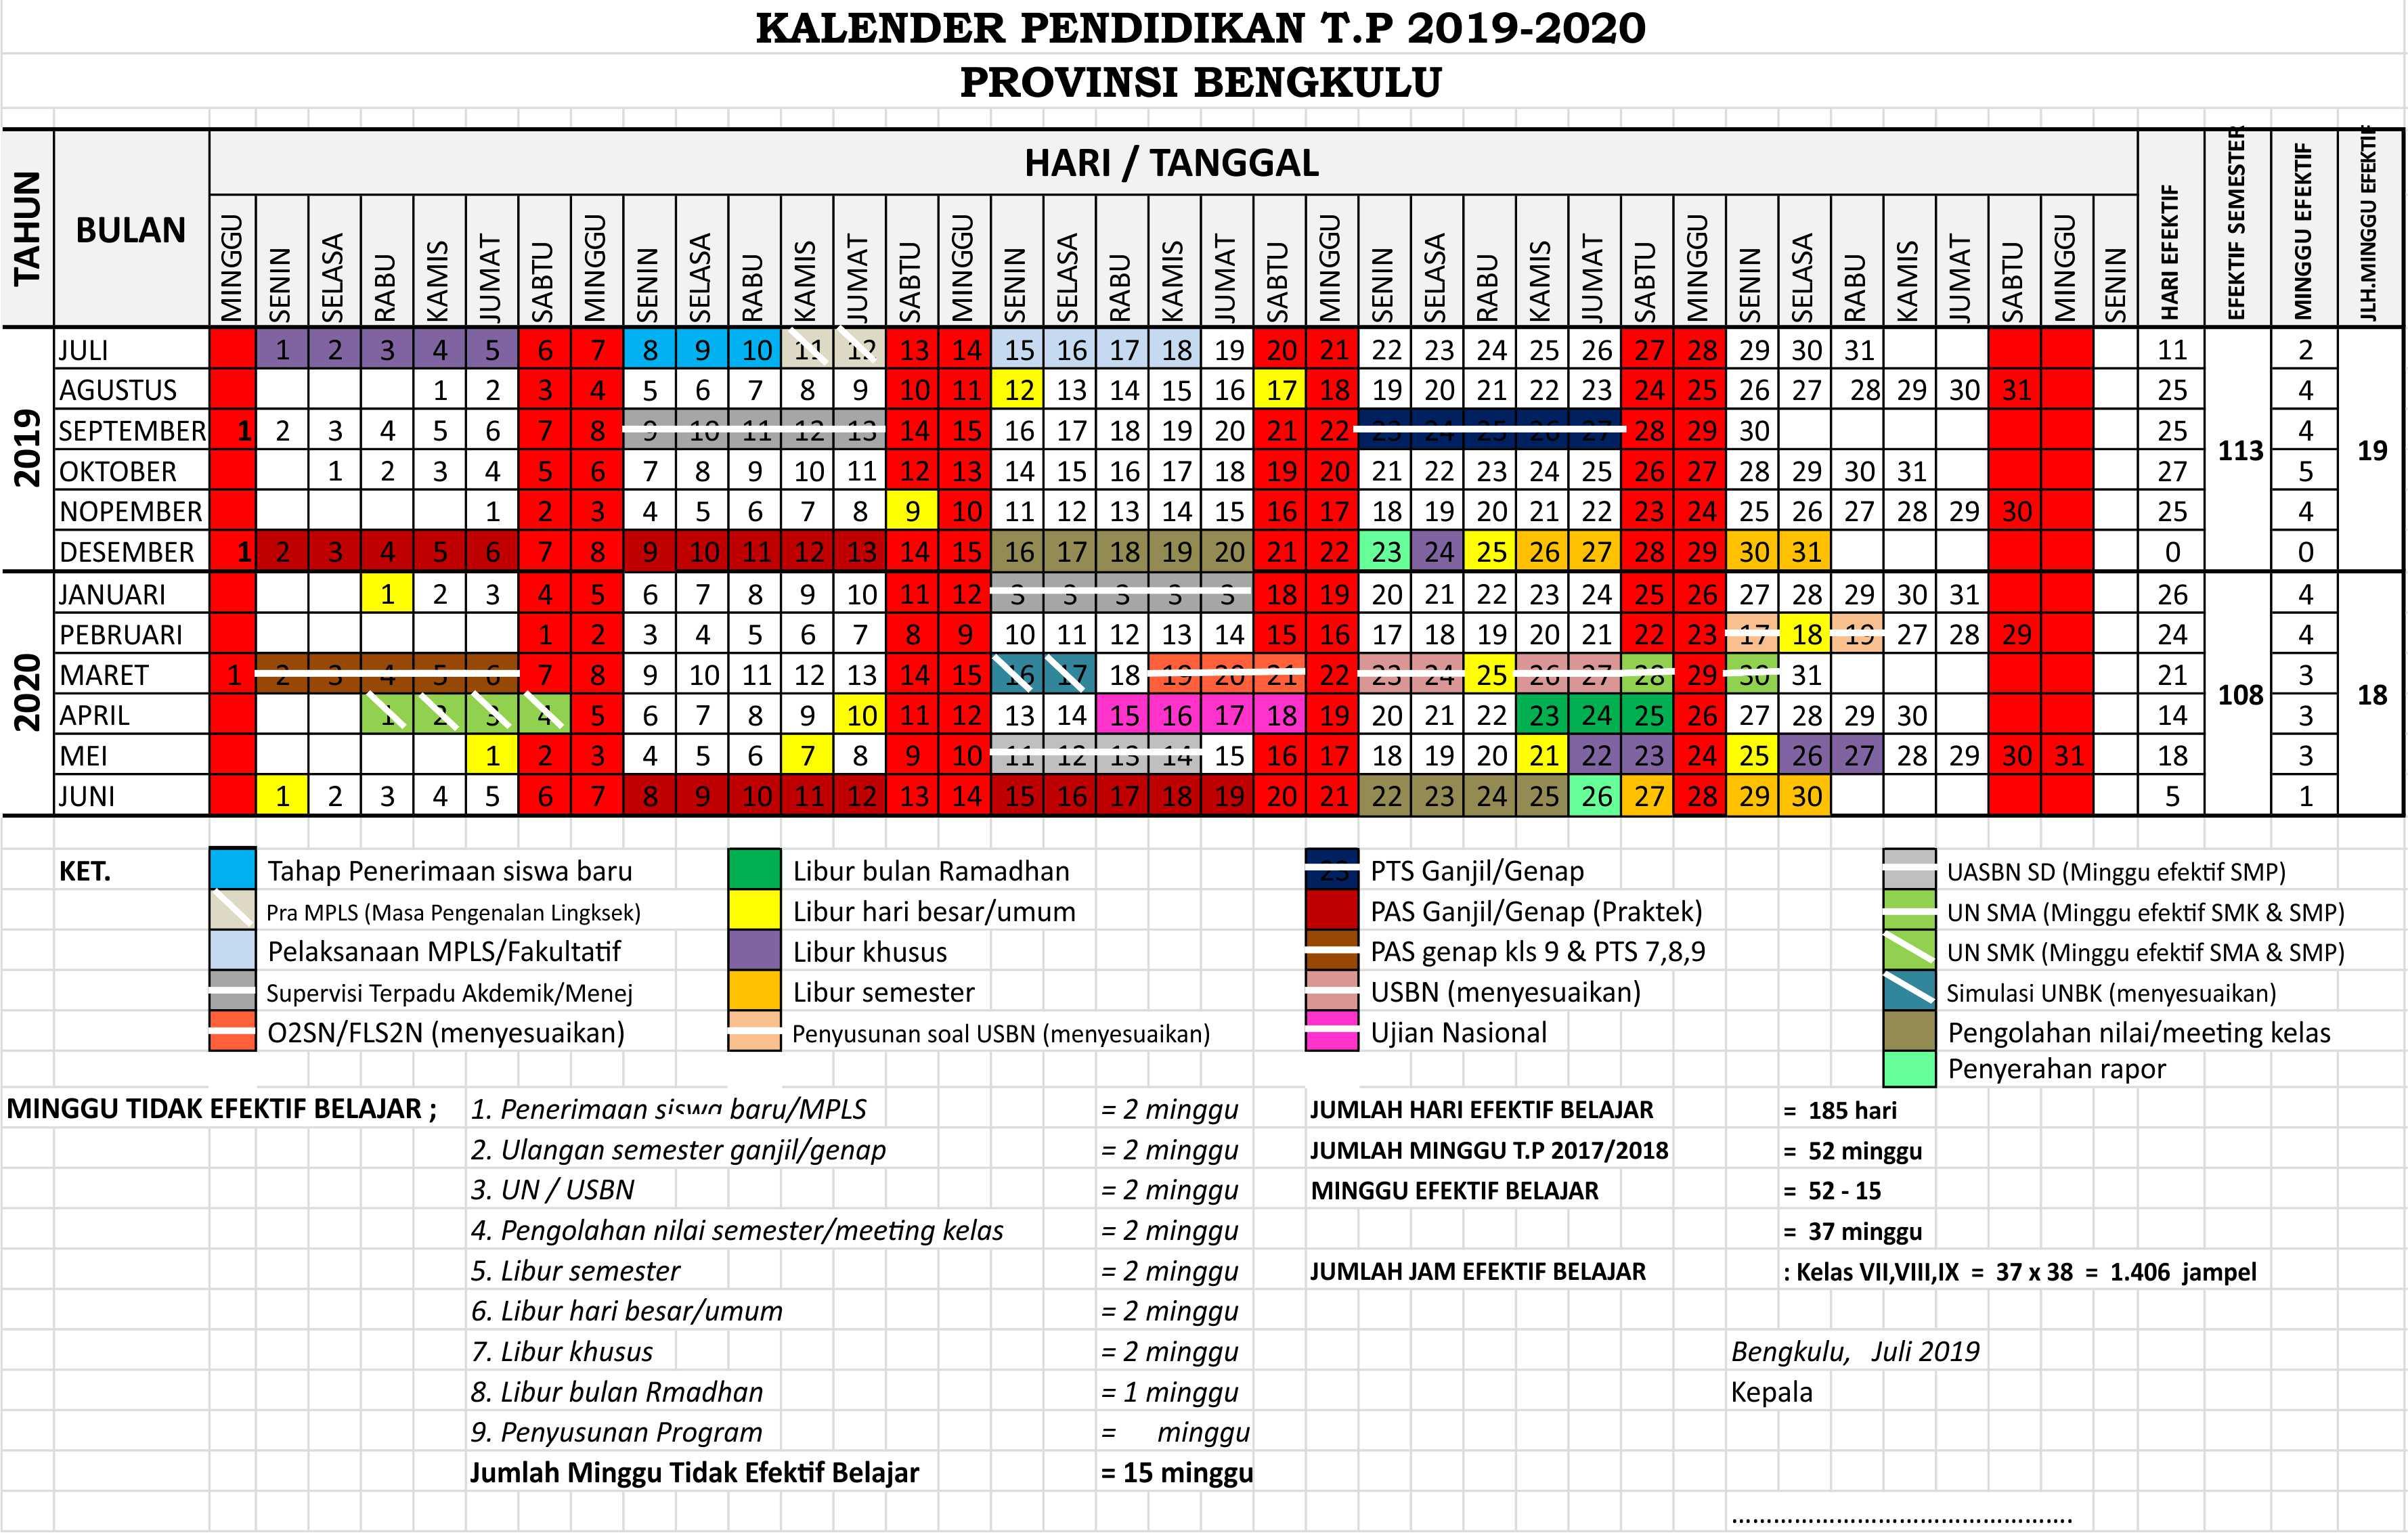 kalender pendidikan 2019 - 2020 bengkulu